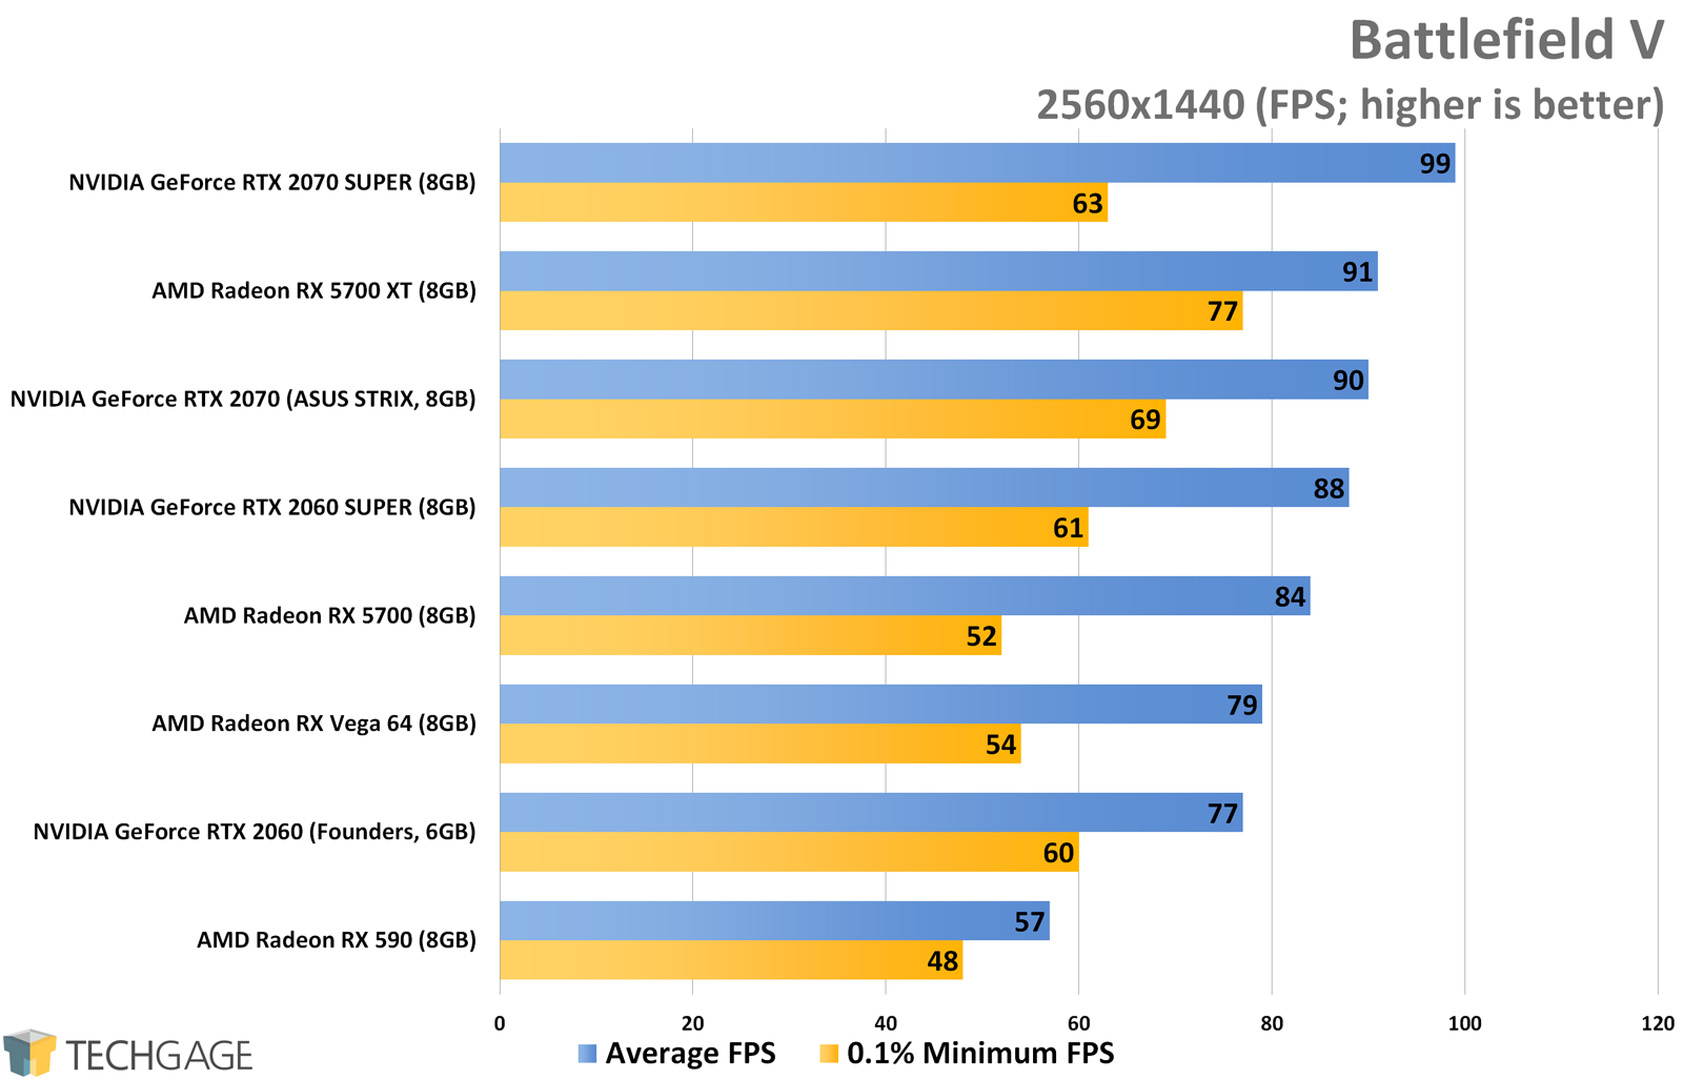 Battlefield V (1440p) - AMD Radeon RX 5700 XT and RX 5700 Performance